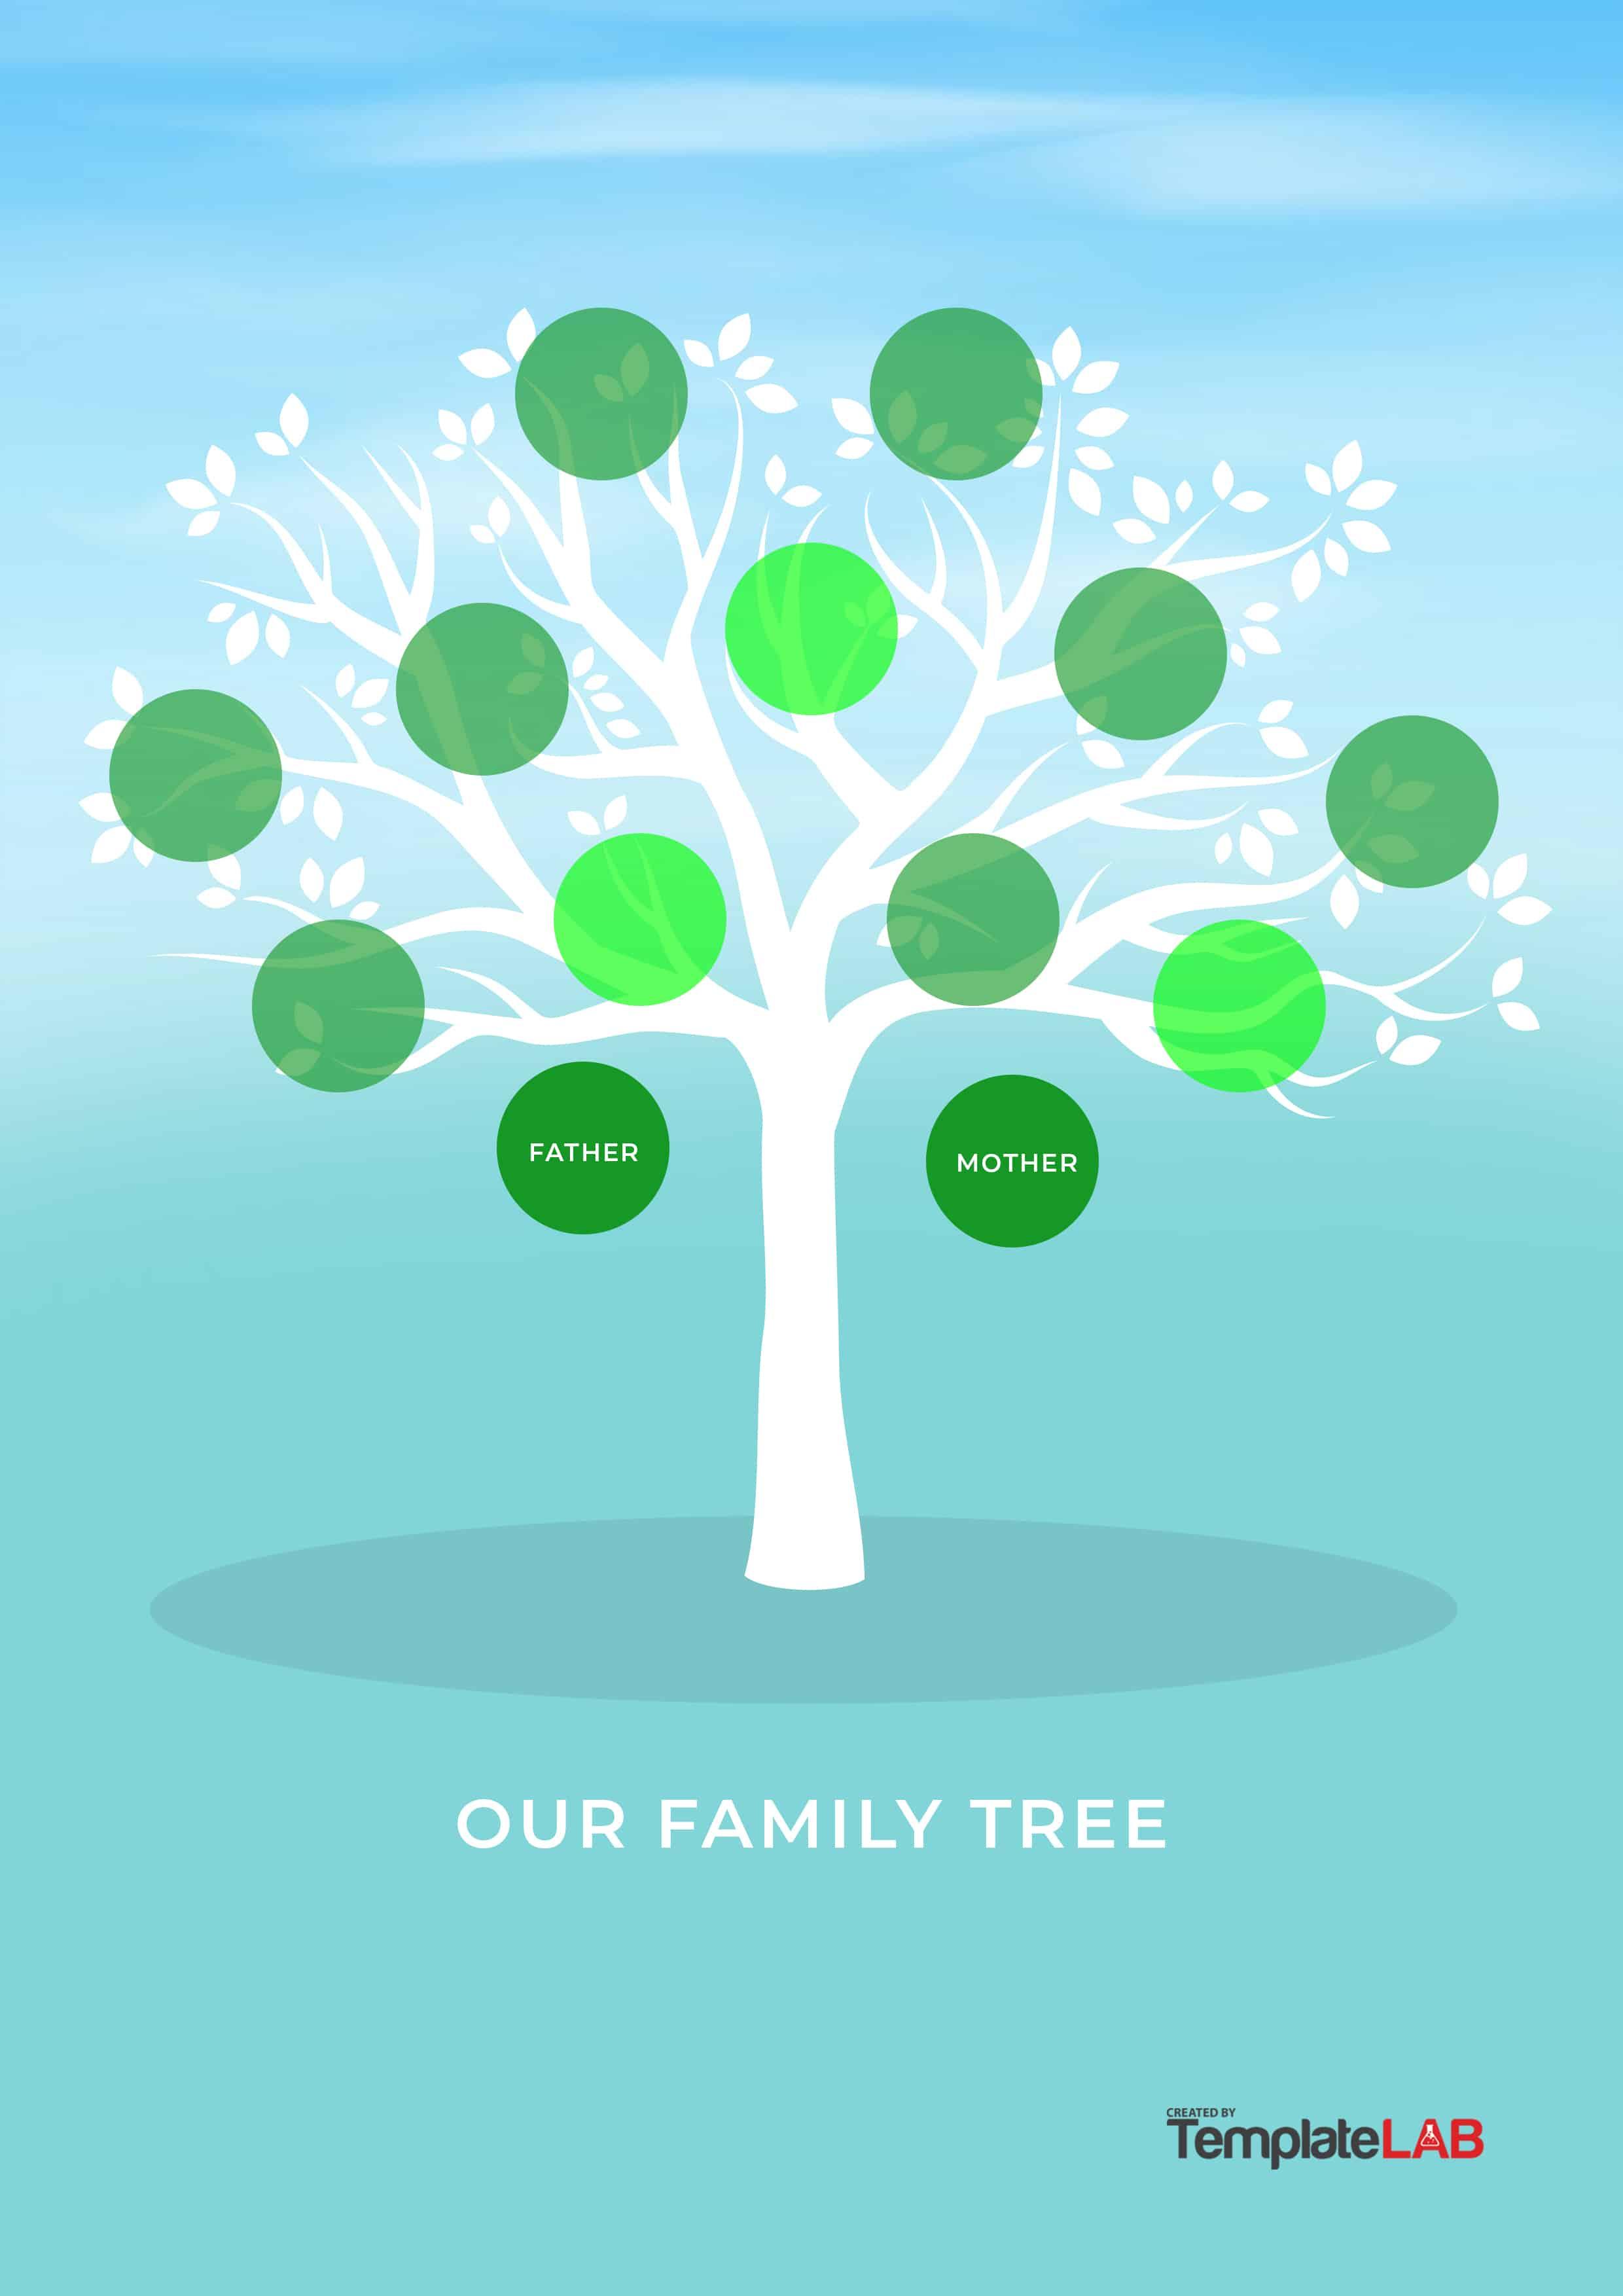 50+ Free Family Tree Templates (Word, Excel, Pdf) - Template Lab - Free Printable Family Tree Template